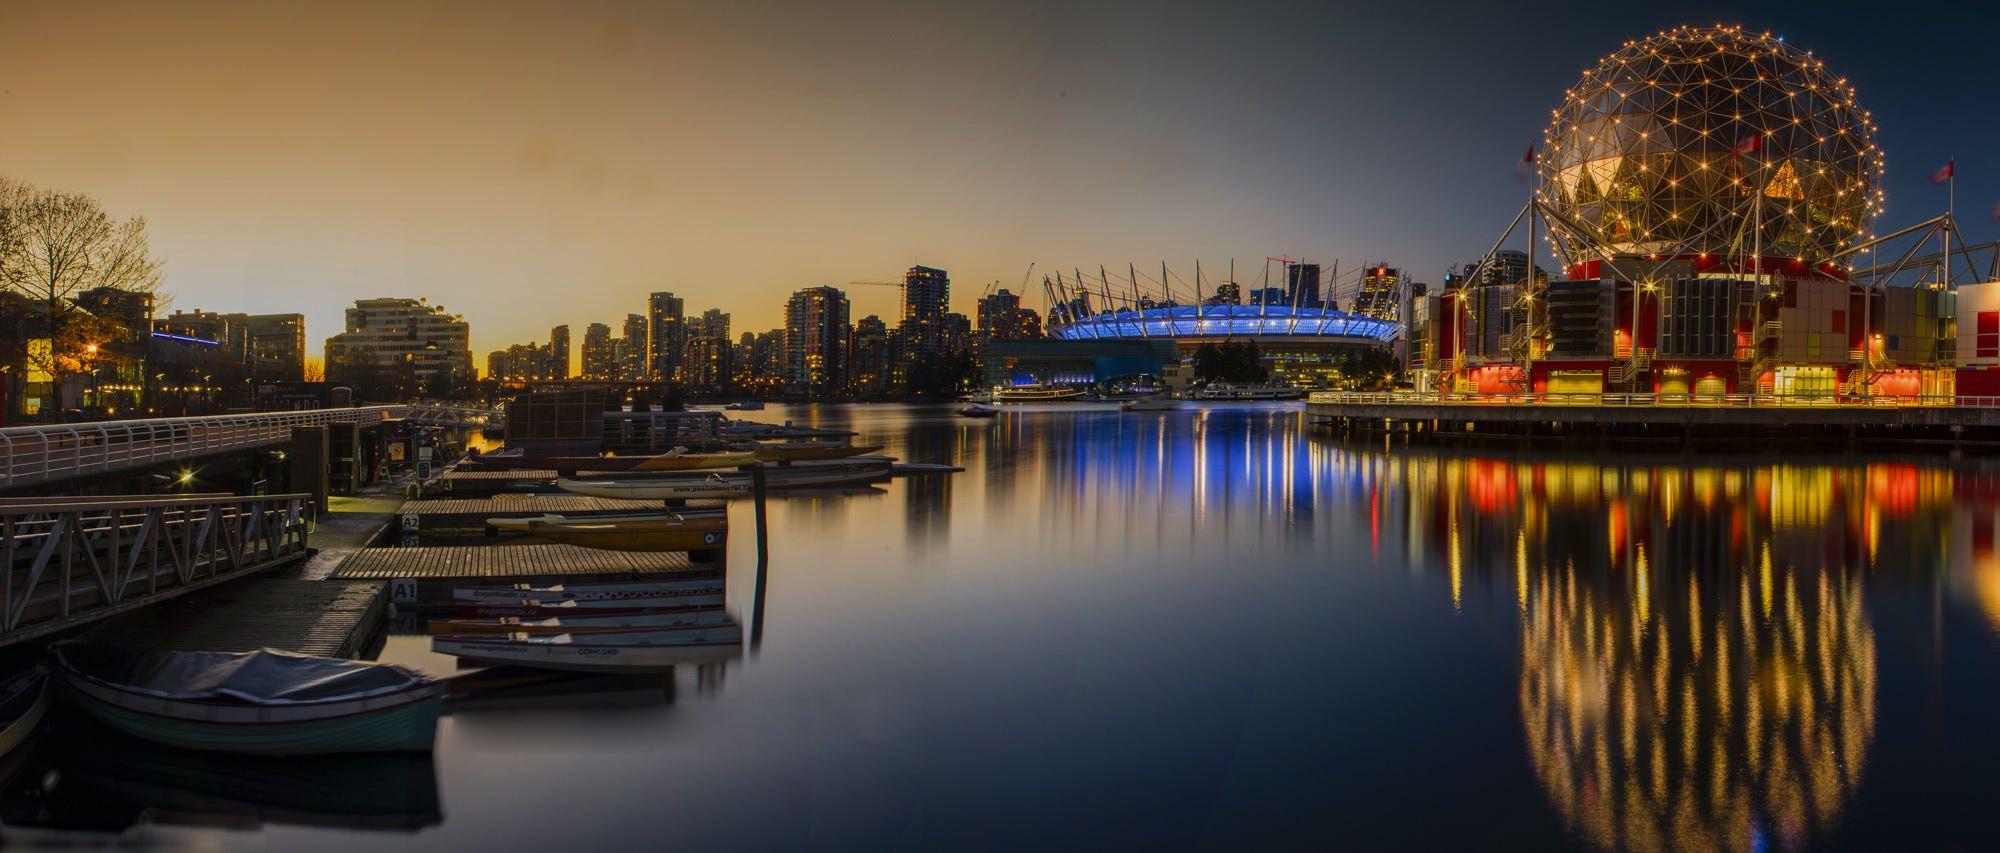 Vancouver city light sunset panorama by Mark Bowen on